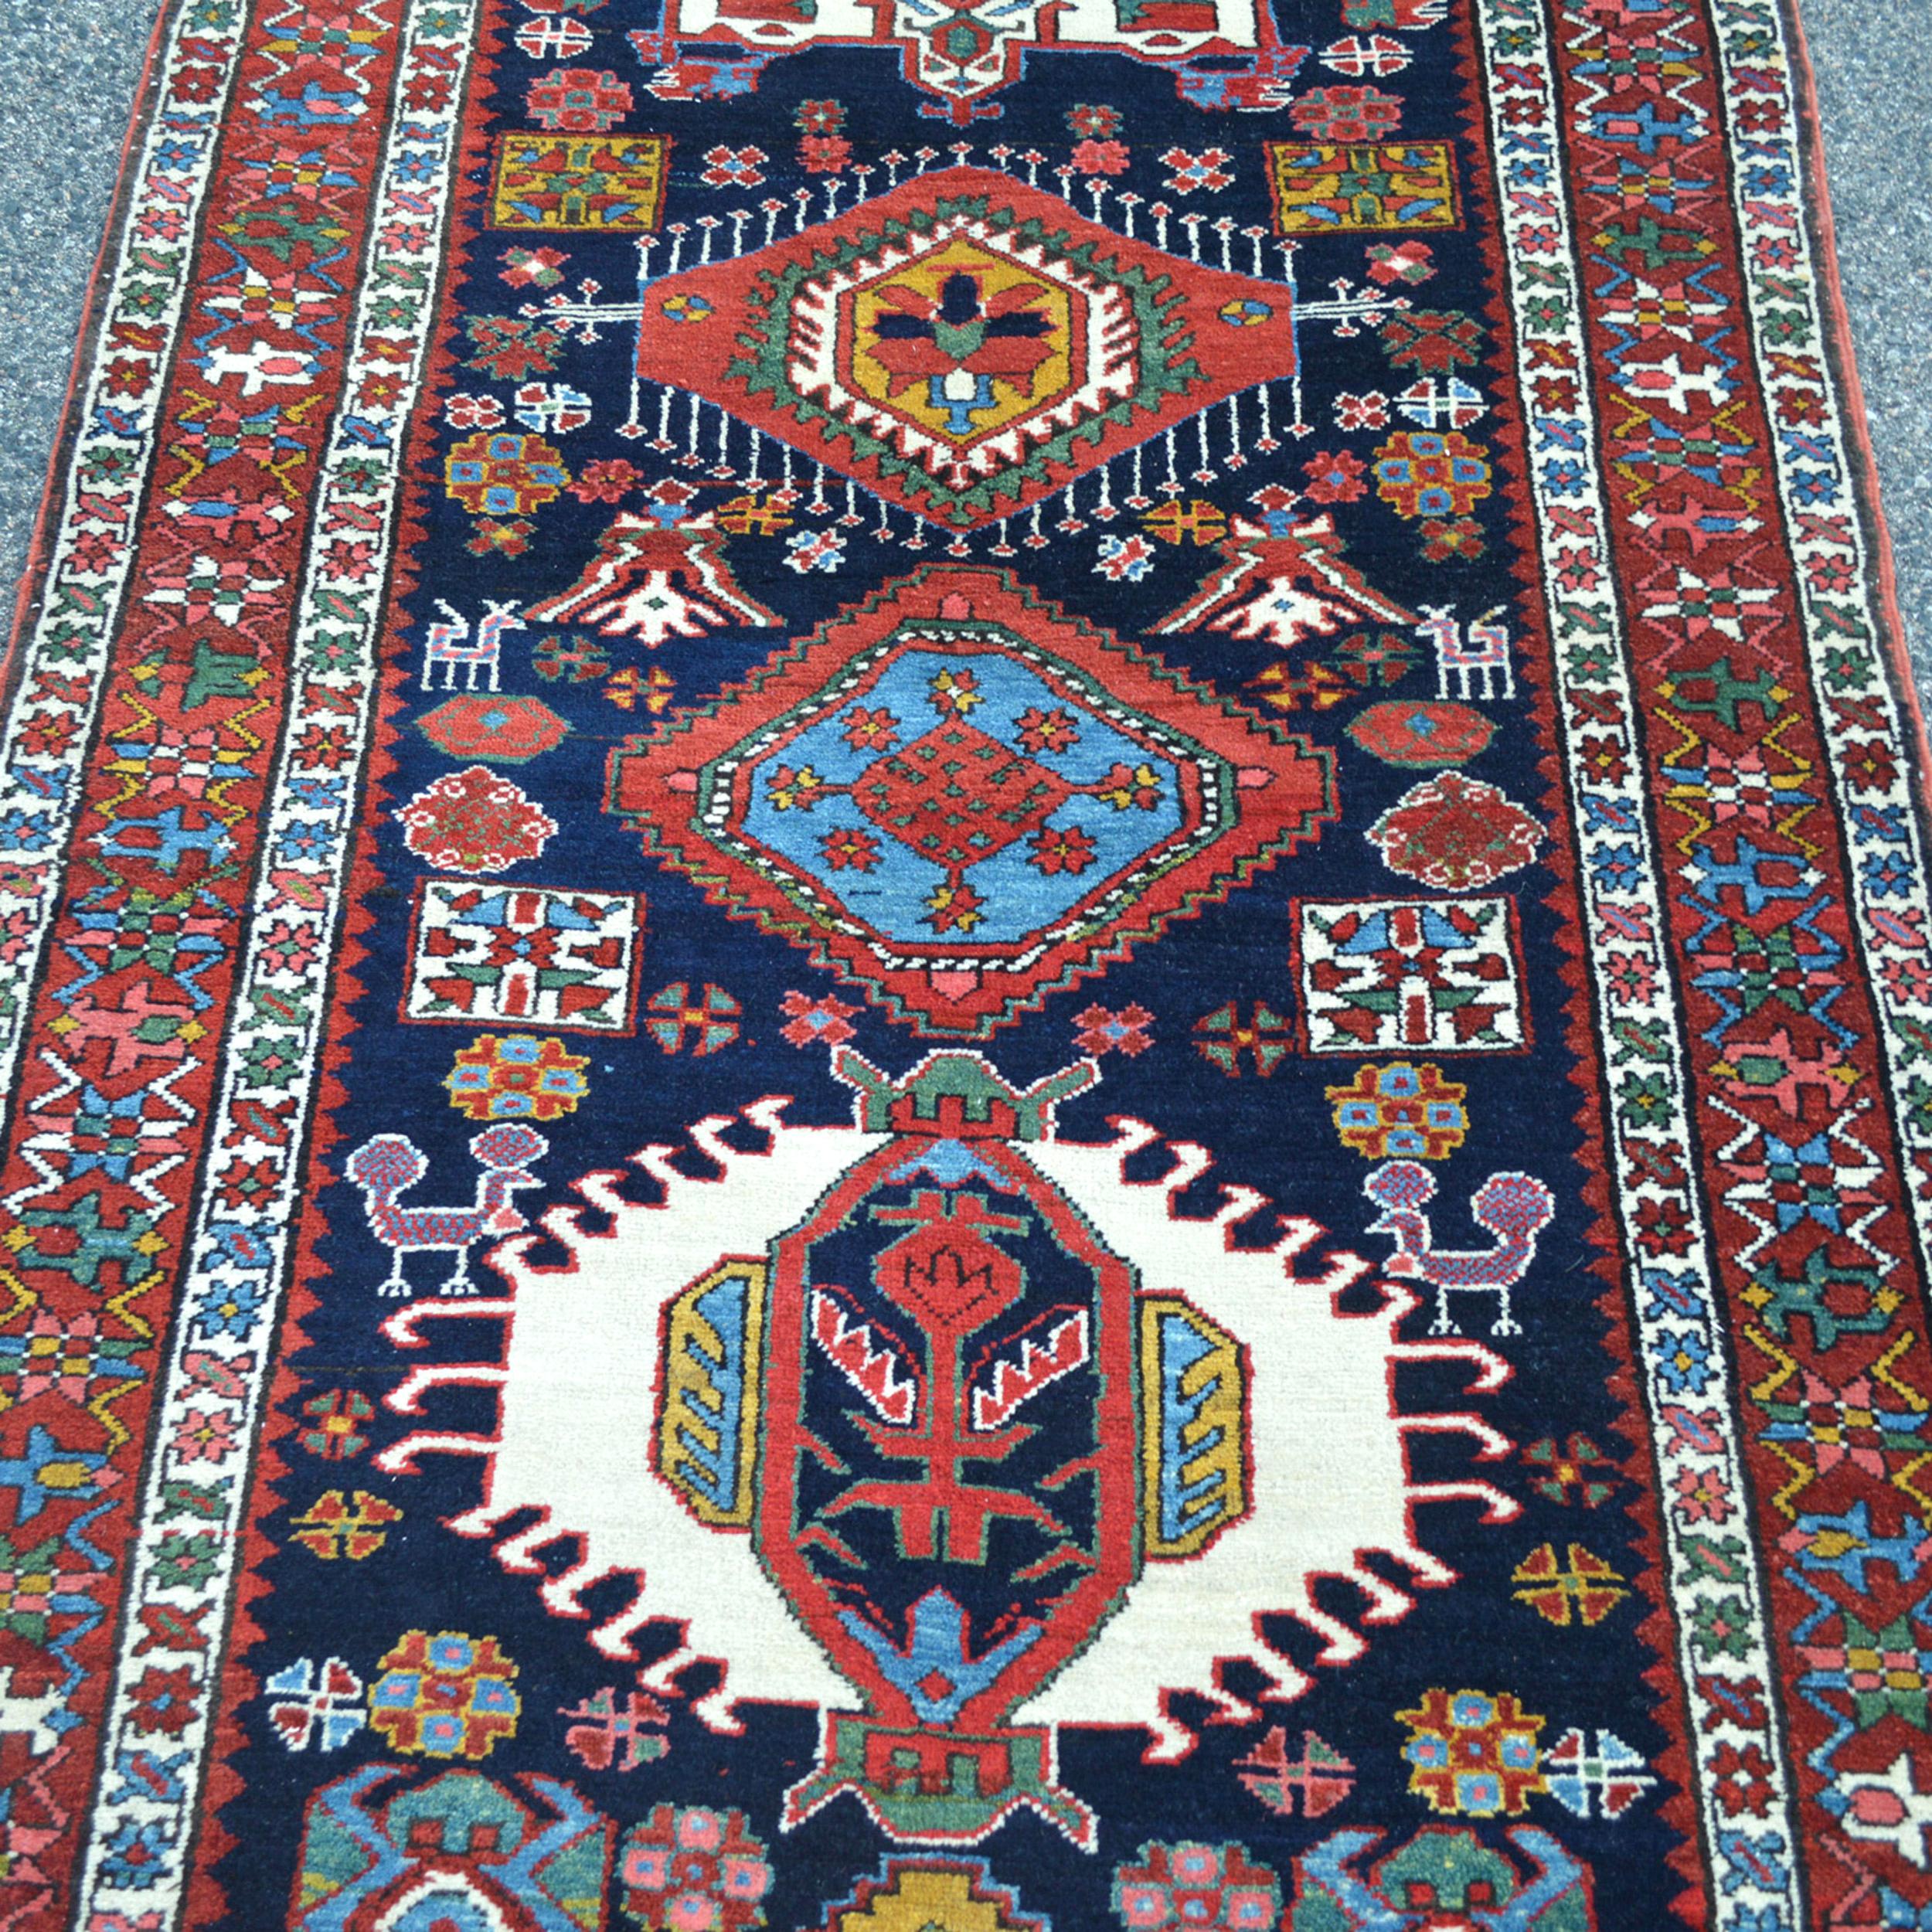 An unusually long antique Persian Heriz Serapi runner rug, antique runners